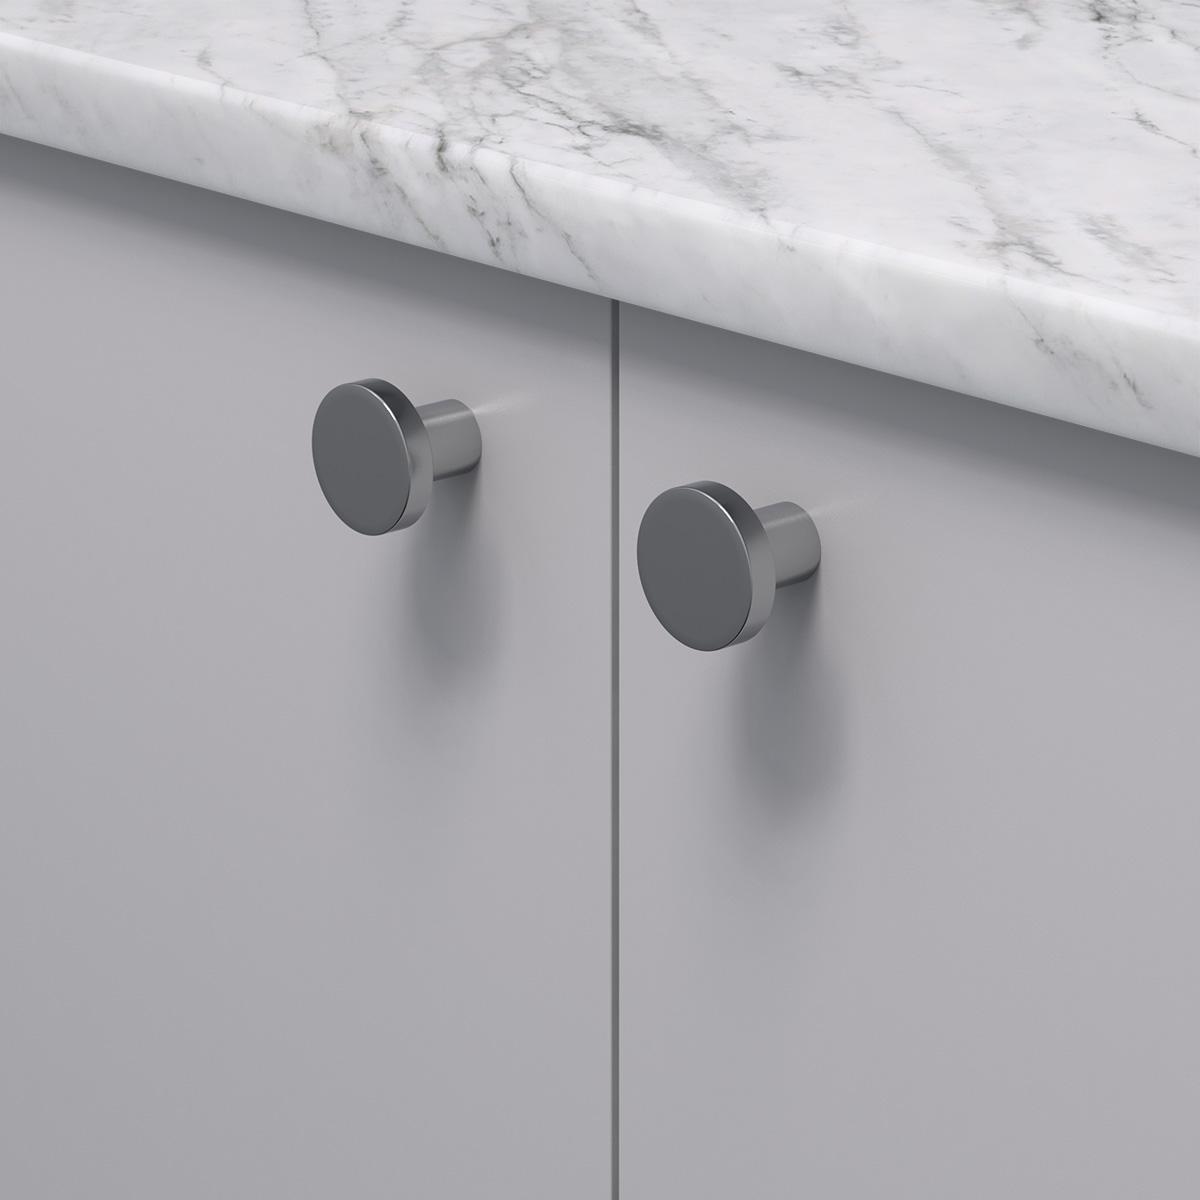 Knopp 2078 krom 368011 11 28 mm ncs s 3000 n marmor carrara